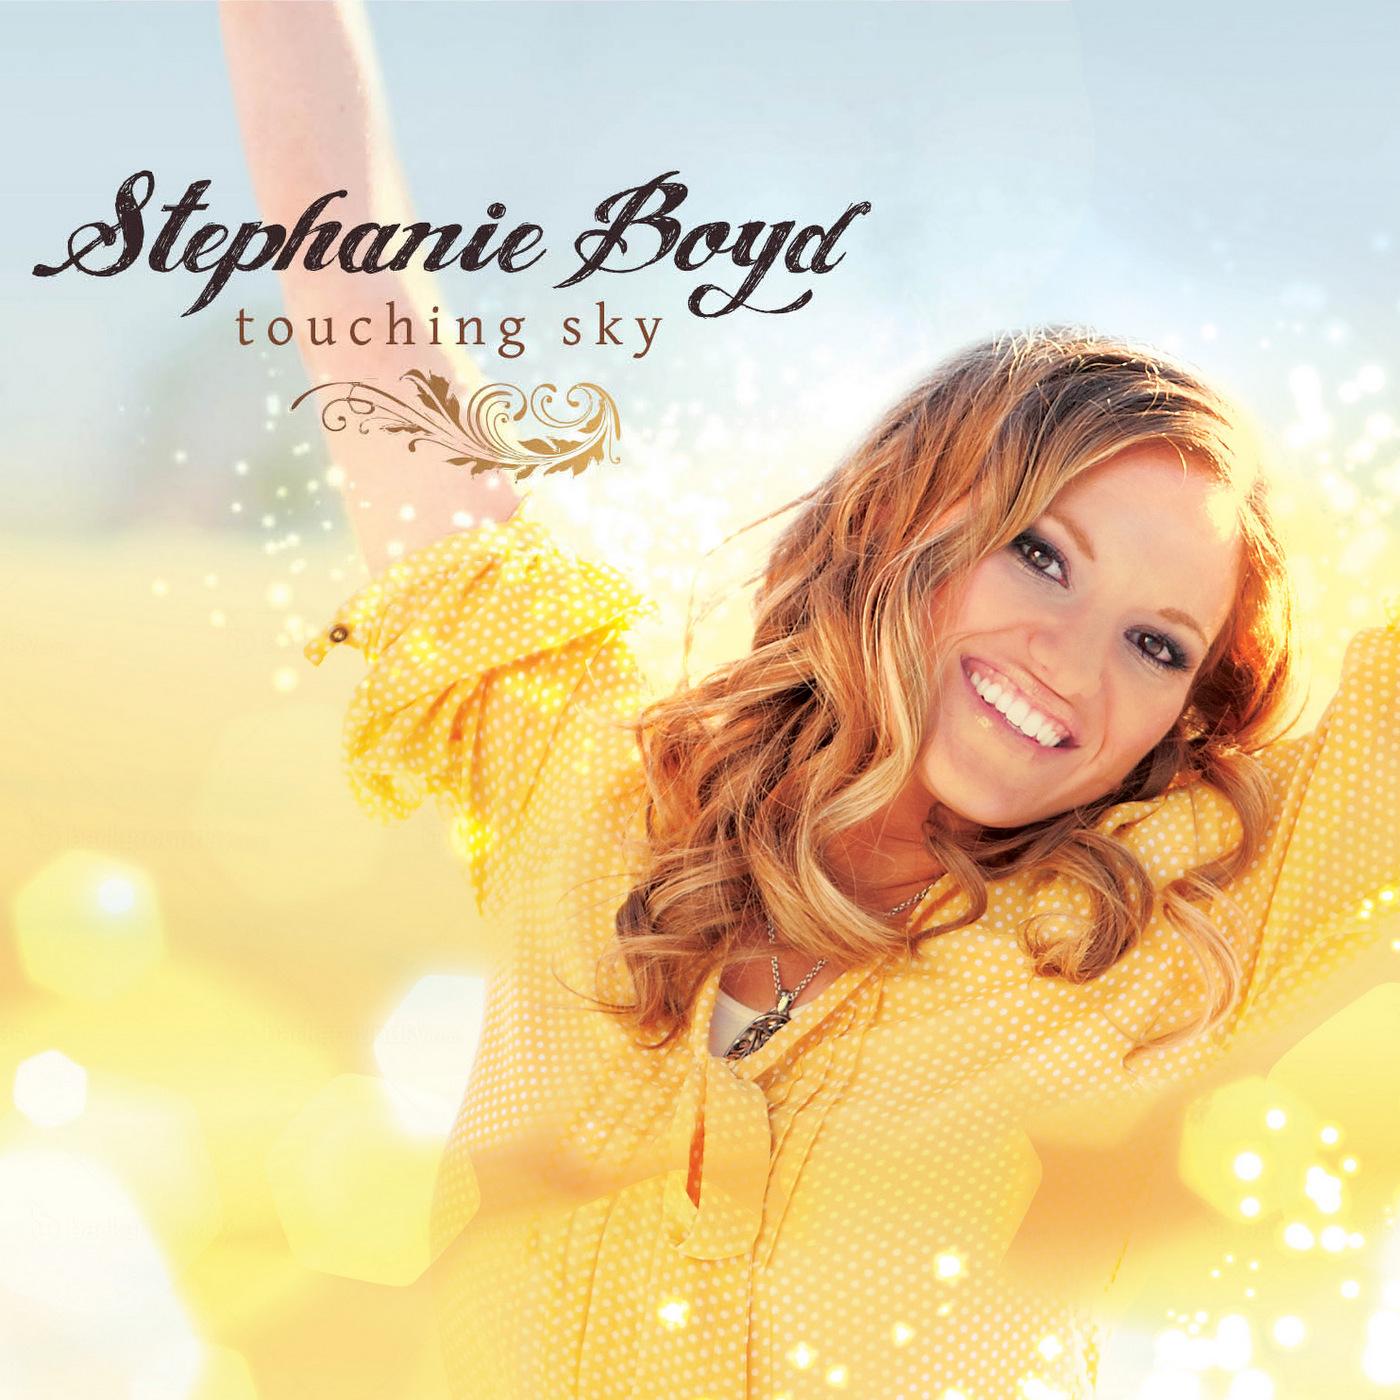 Touching Sky - Album Cover